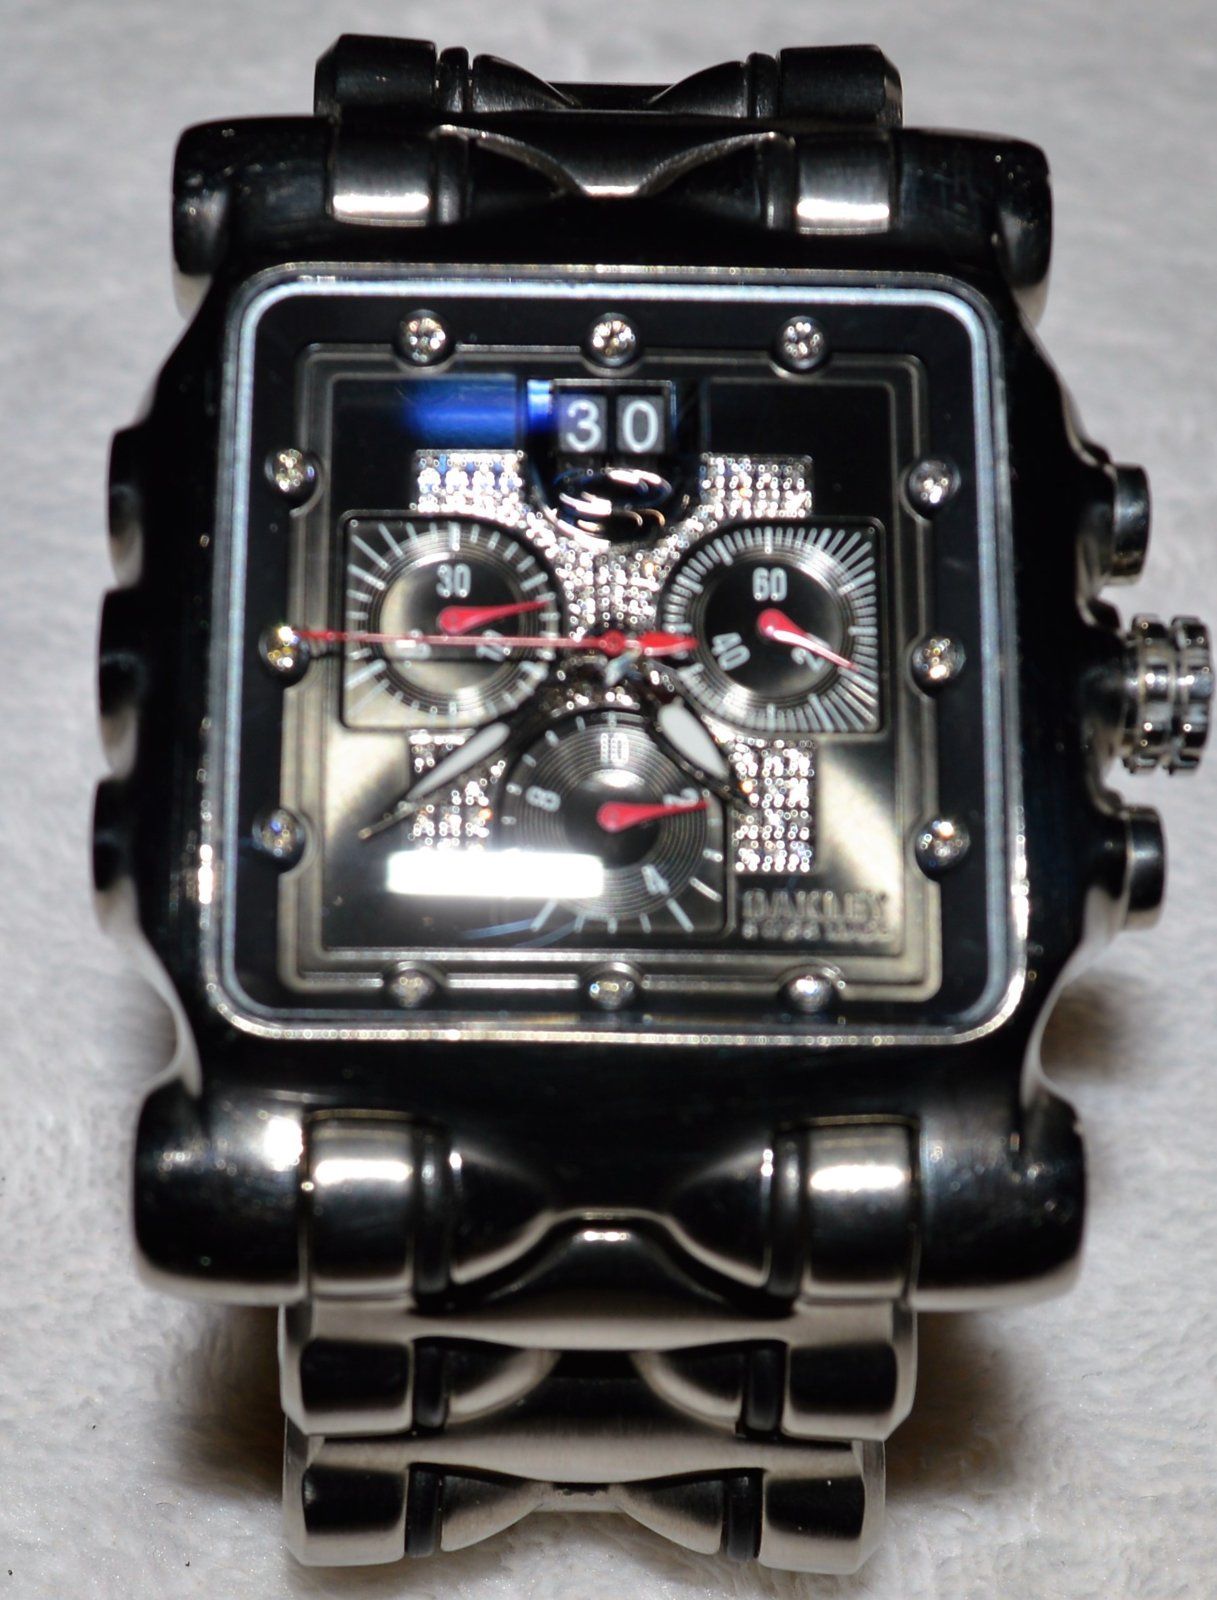 9c54f382d6d63 Diamond Black Face Oakley Minute Machine - DSC 0046b.JPG